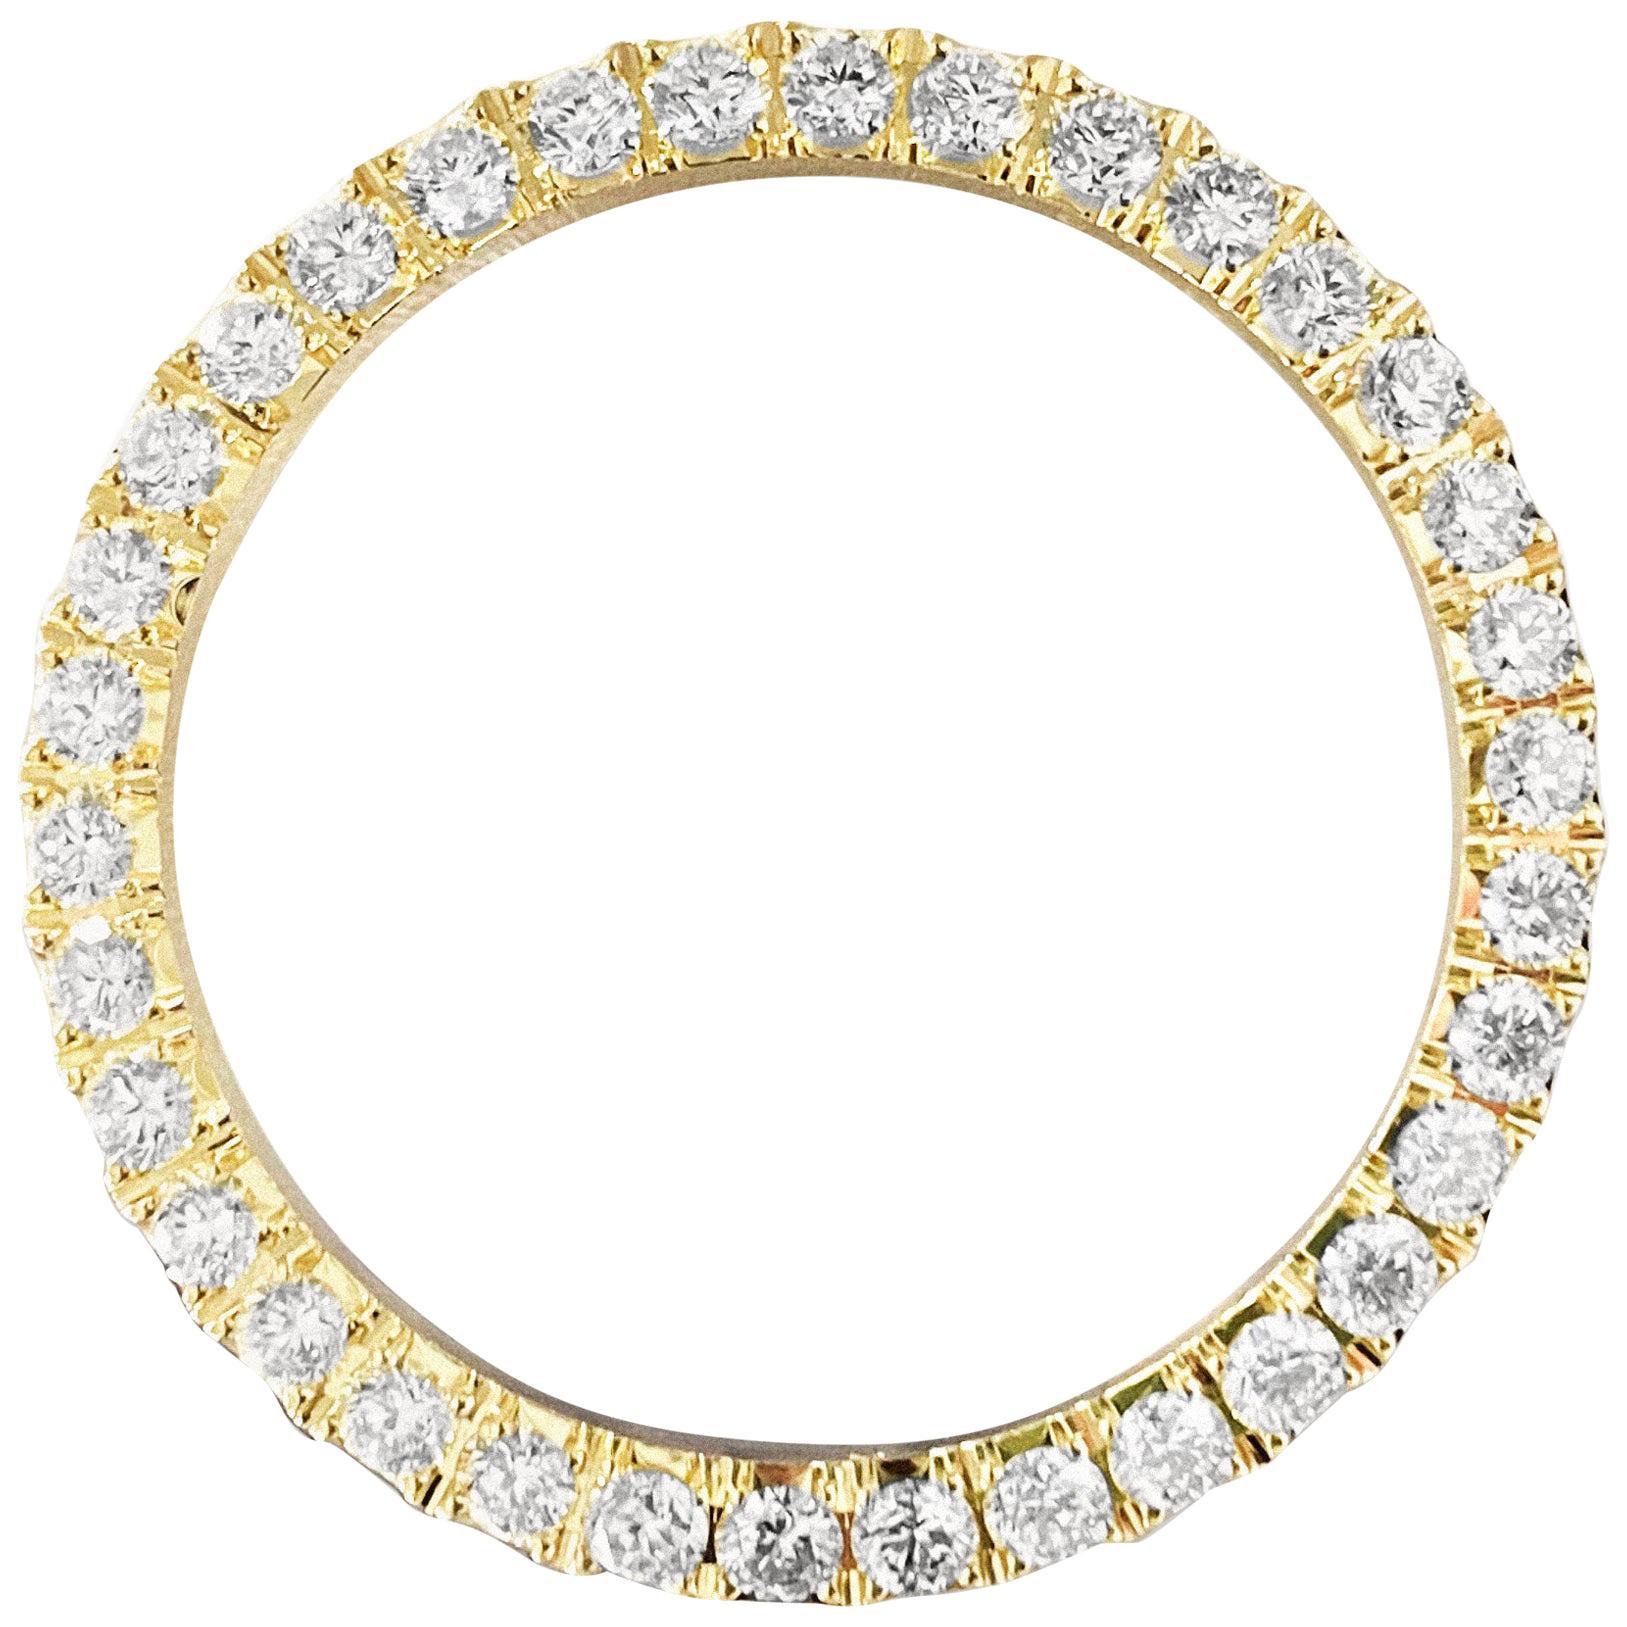 Rolex Bezel 4.50 Carat VVS Diamonds 14 Karat Yellow Gold